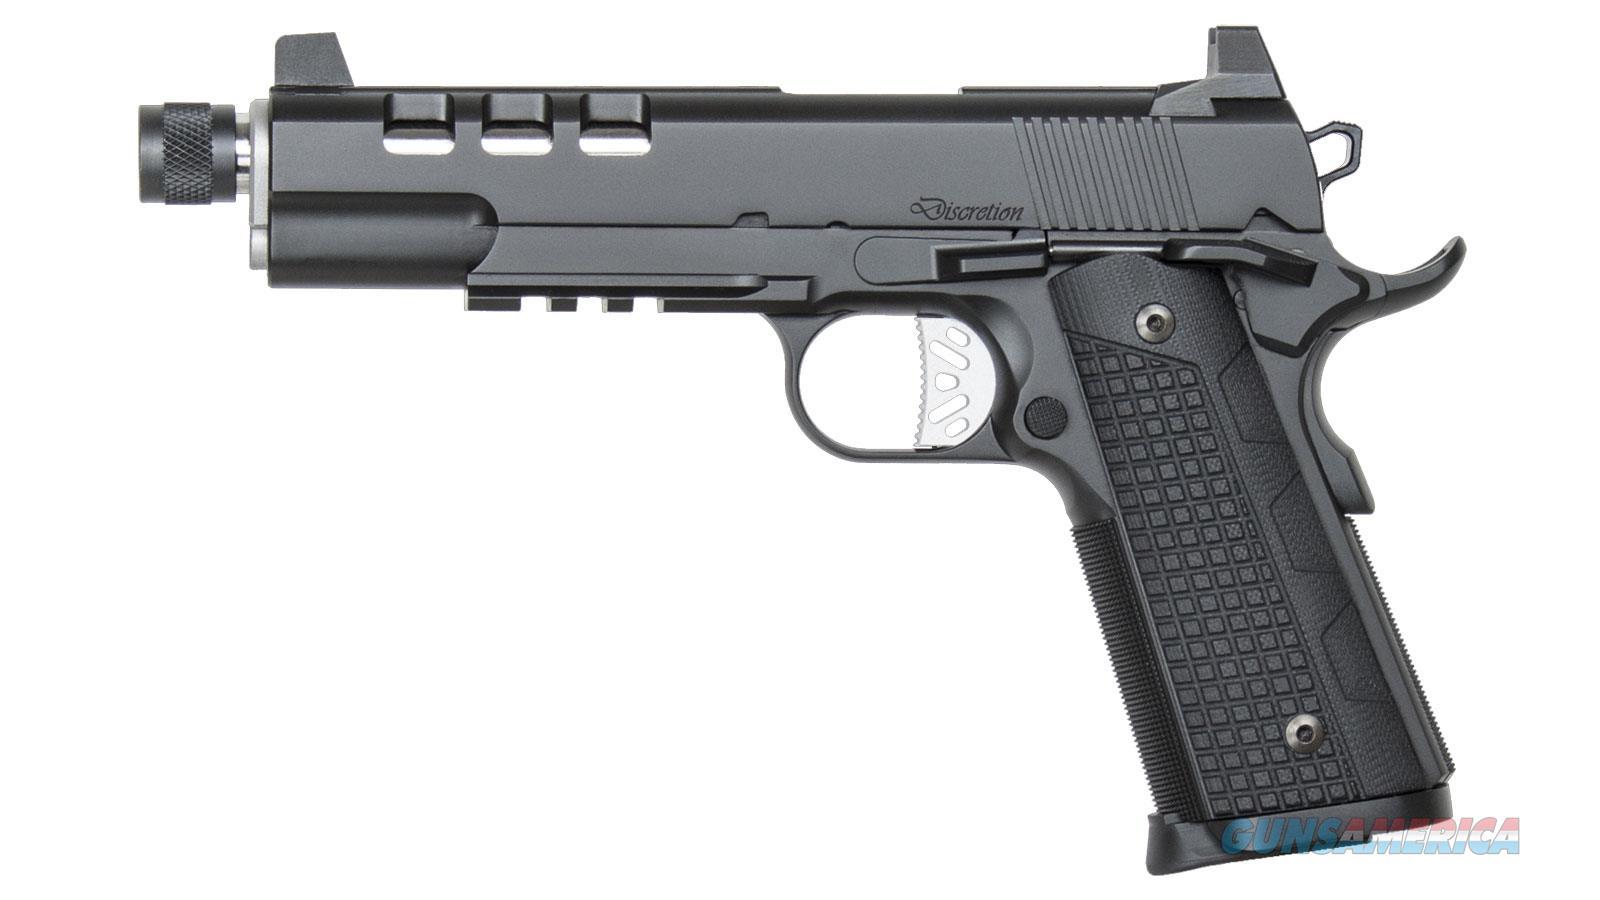 Czusa Dw Discretion 45Acp Blk Supp Ready Ns Rail 01885  Guns > Pistols > C Misc Pistols